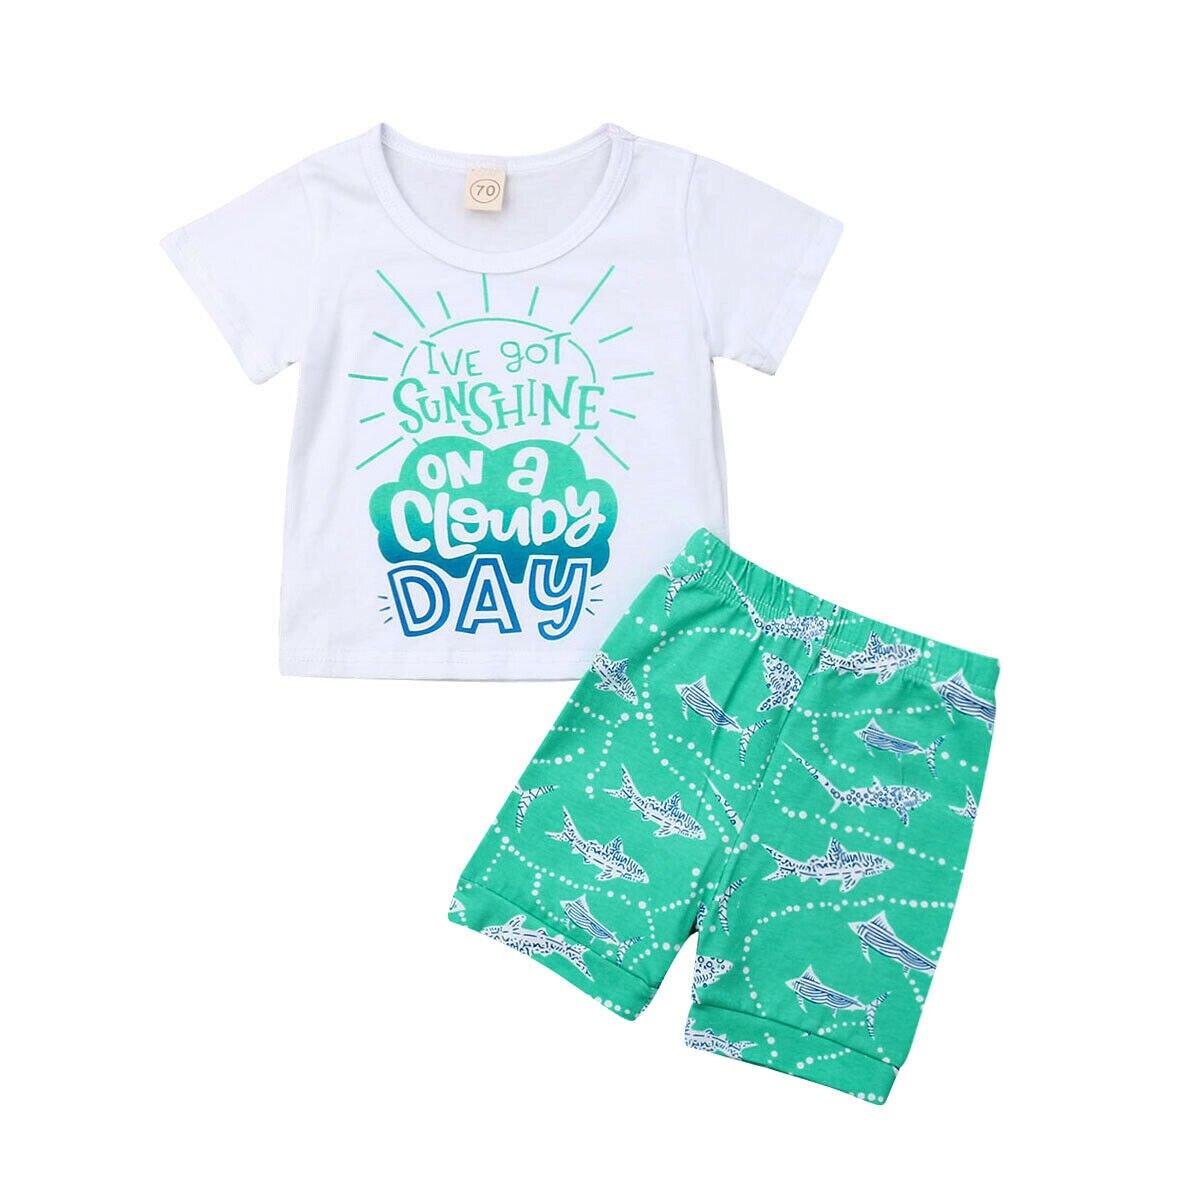 0-5y Kleinkind Kinder Baby Jungen Sommer Kleidung Kurzarm Baumwolle T-shirt Tops Shorts Hose 2 Pcs Outfits Beachwear Kleidung Set